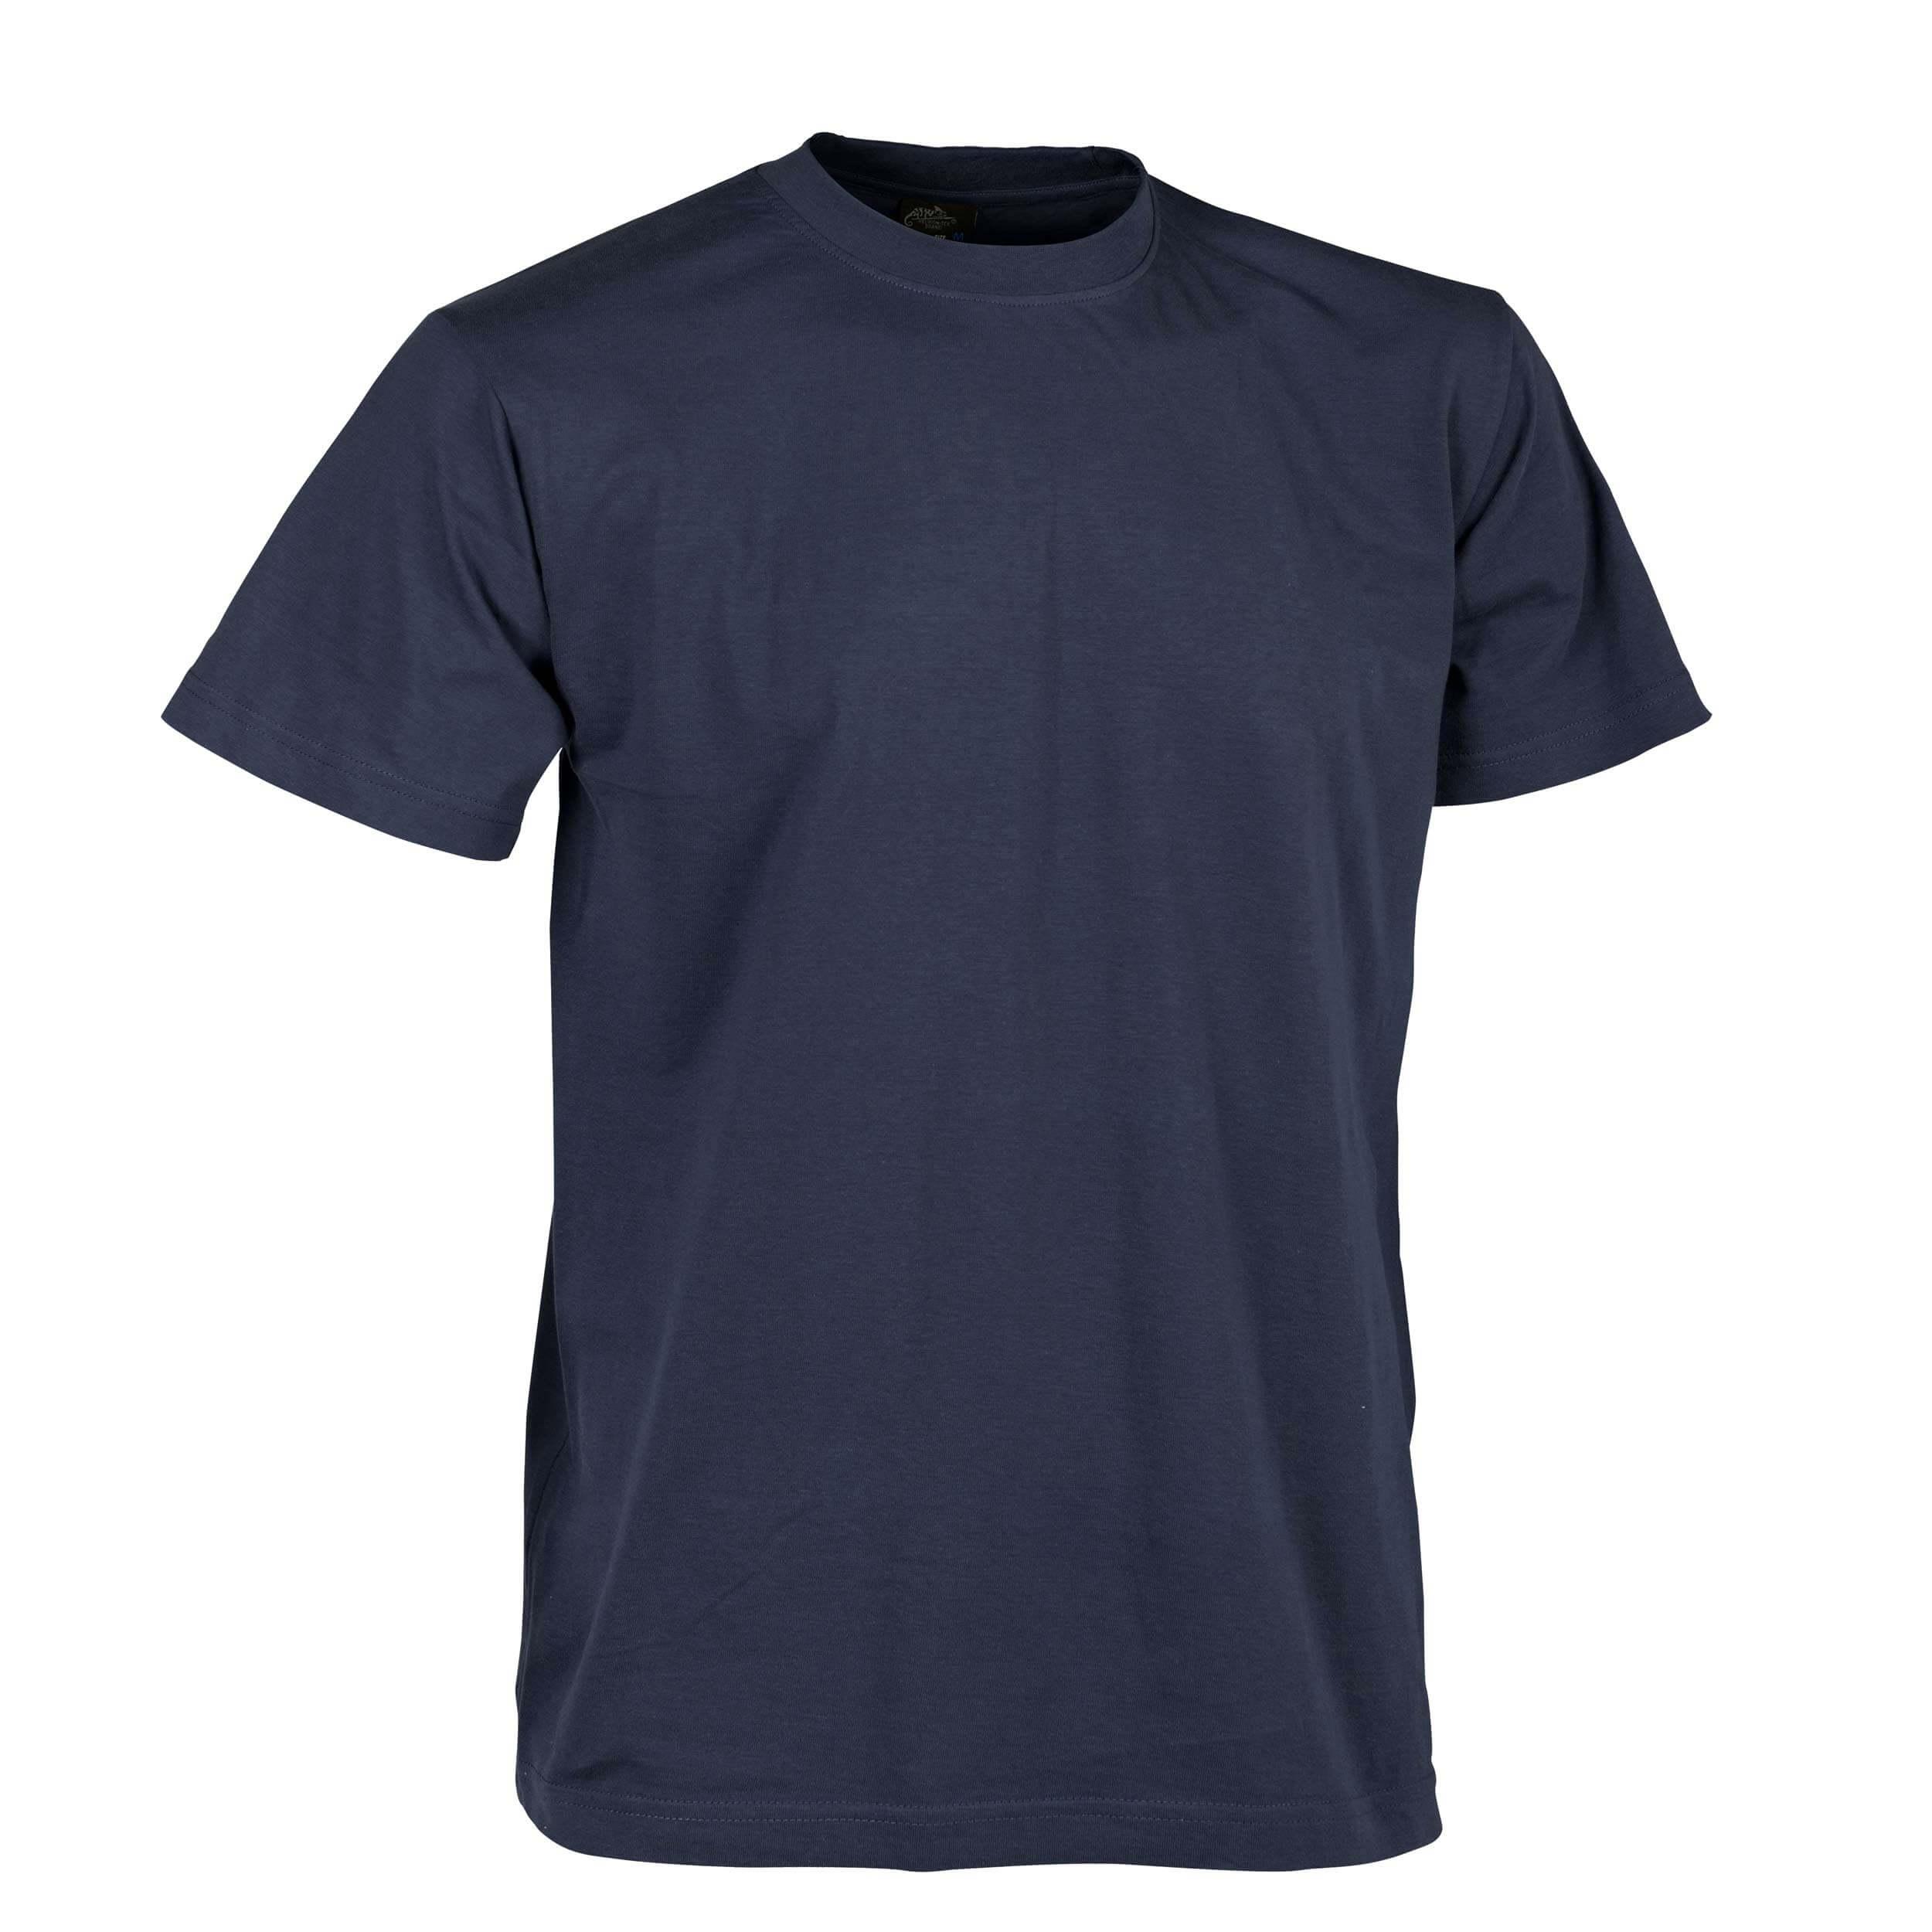 Helikon-Tex Classic Army T-Shirt Navy Blue